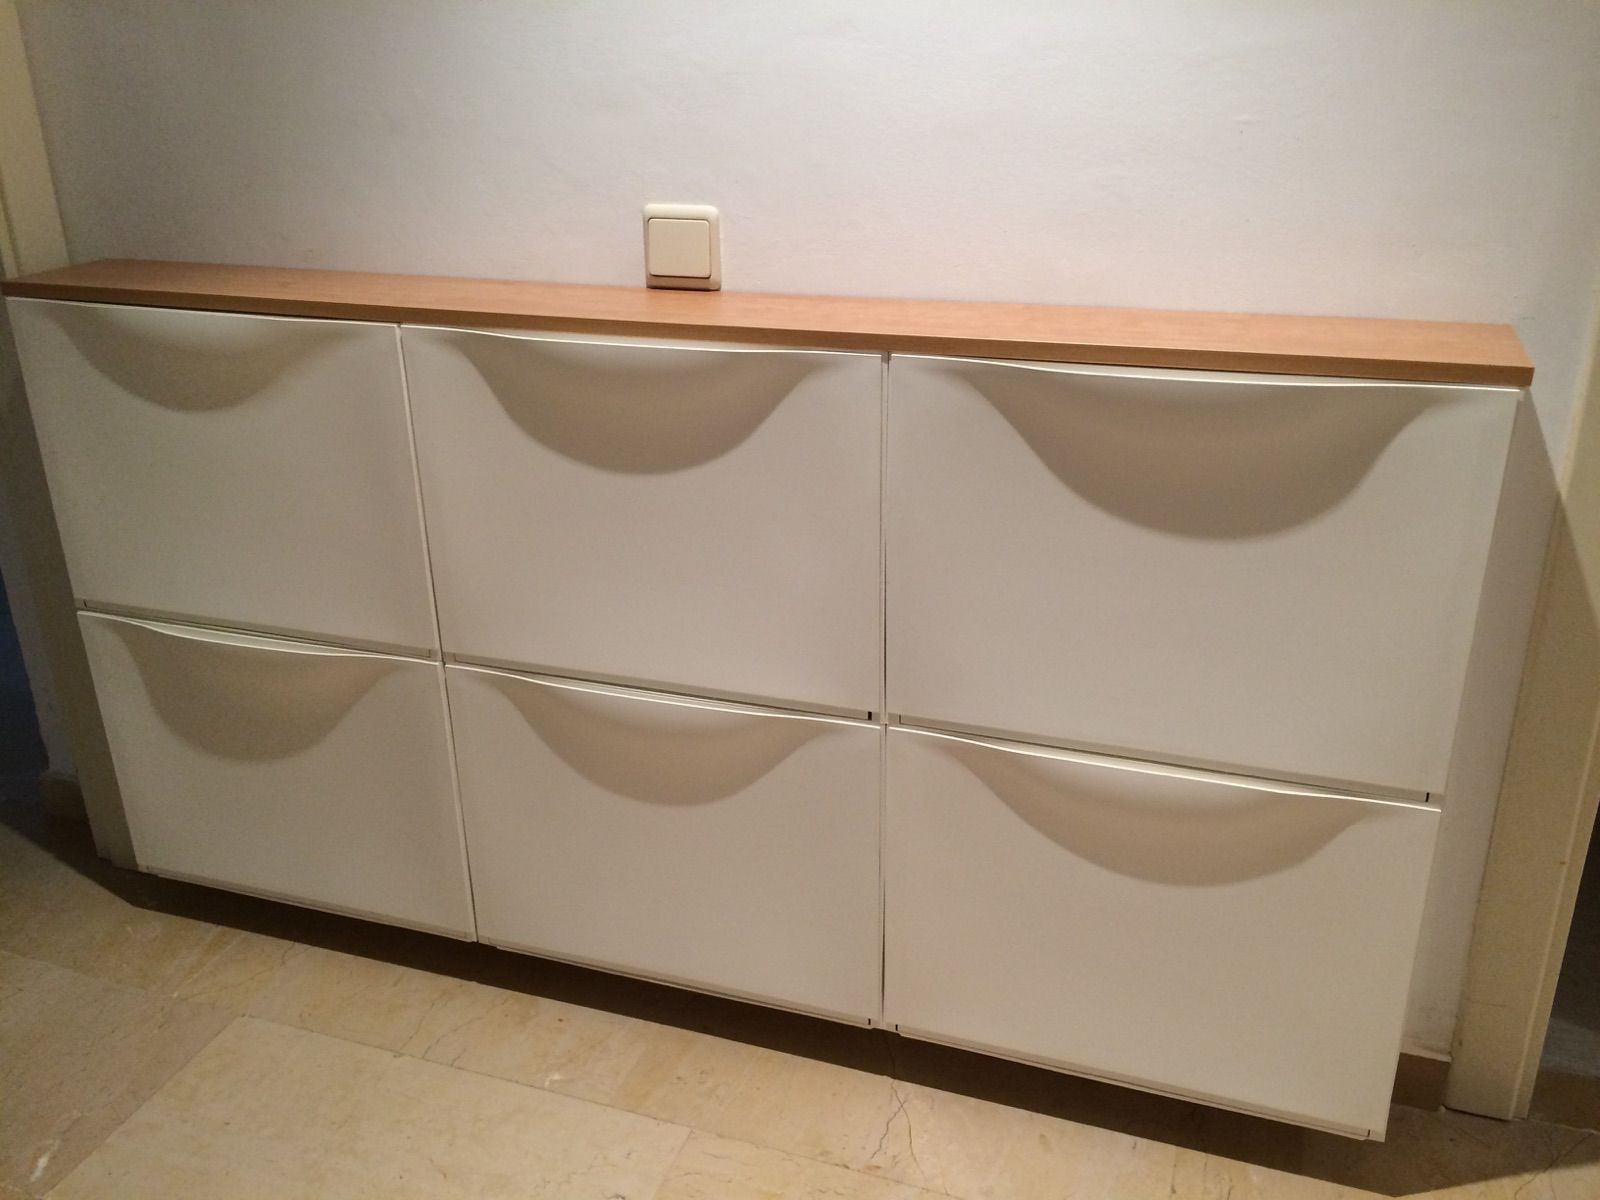 Ikea Küchengriffe Anbringen ~ zapatero ikea tuneado sabaters pinterest